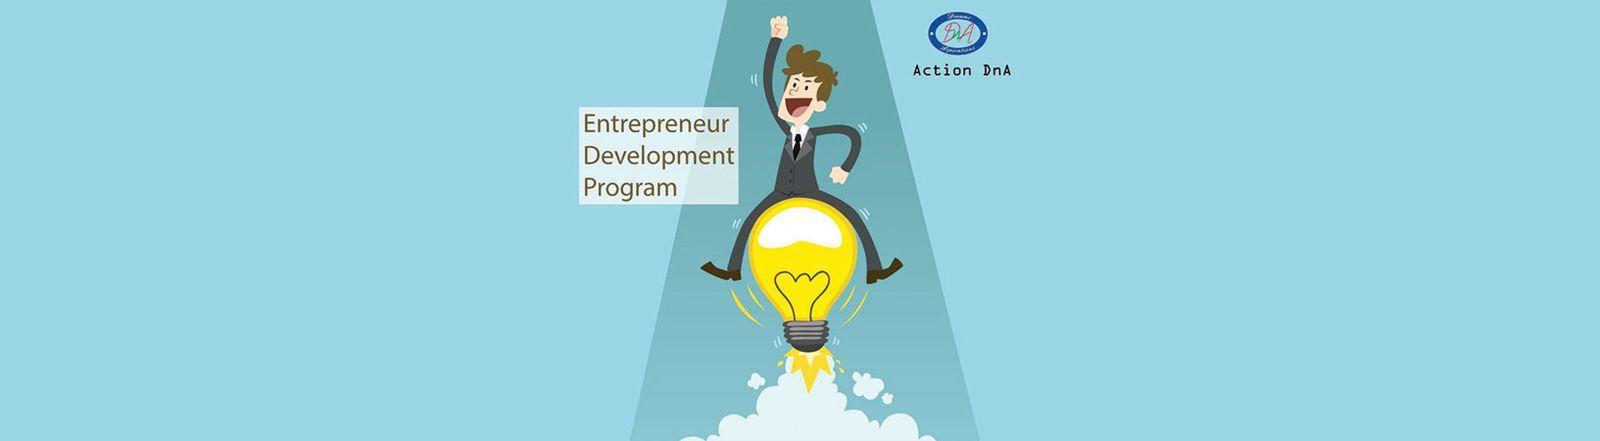 1482381971entrepreneurship-workshop,-bang_1